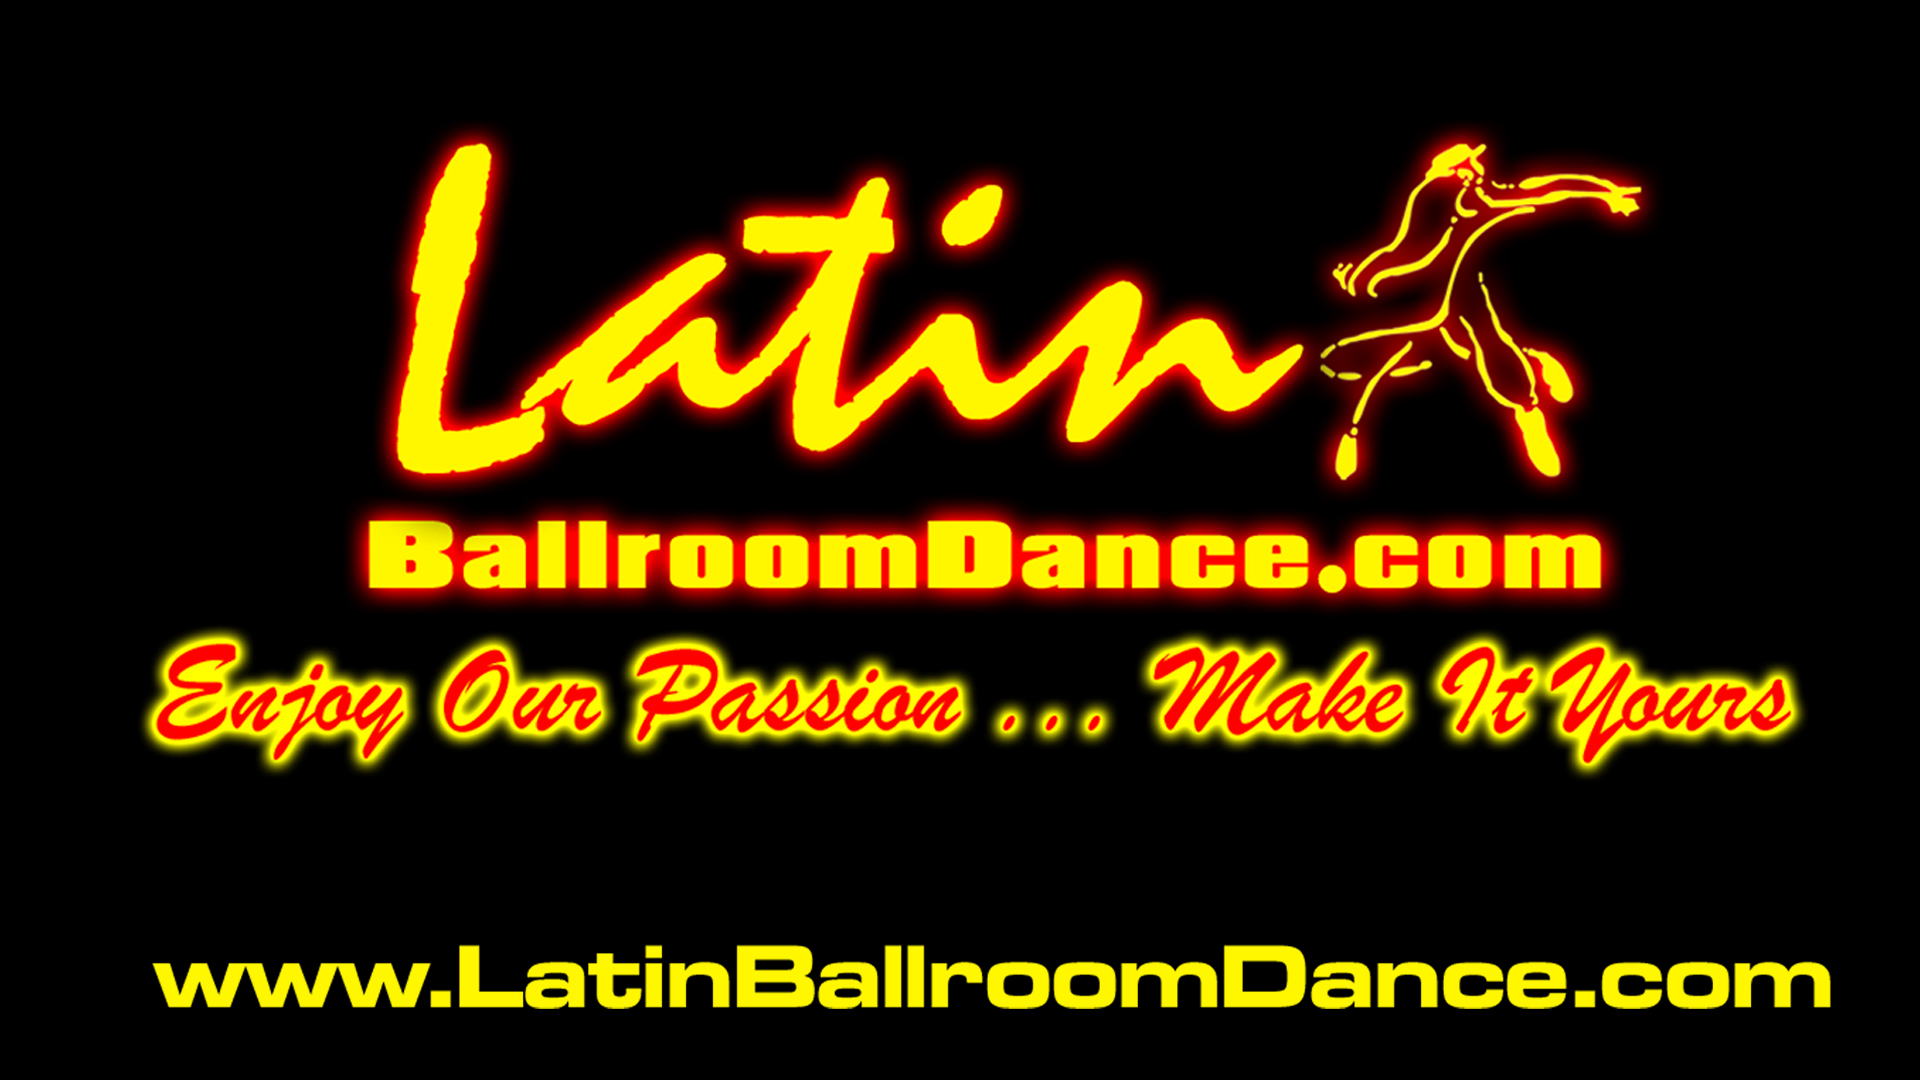 Latin Ballroom Dance (2) - Copy.jpg